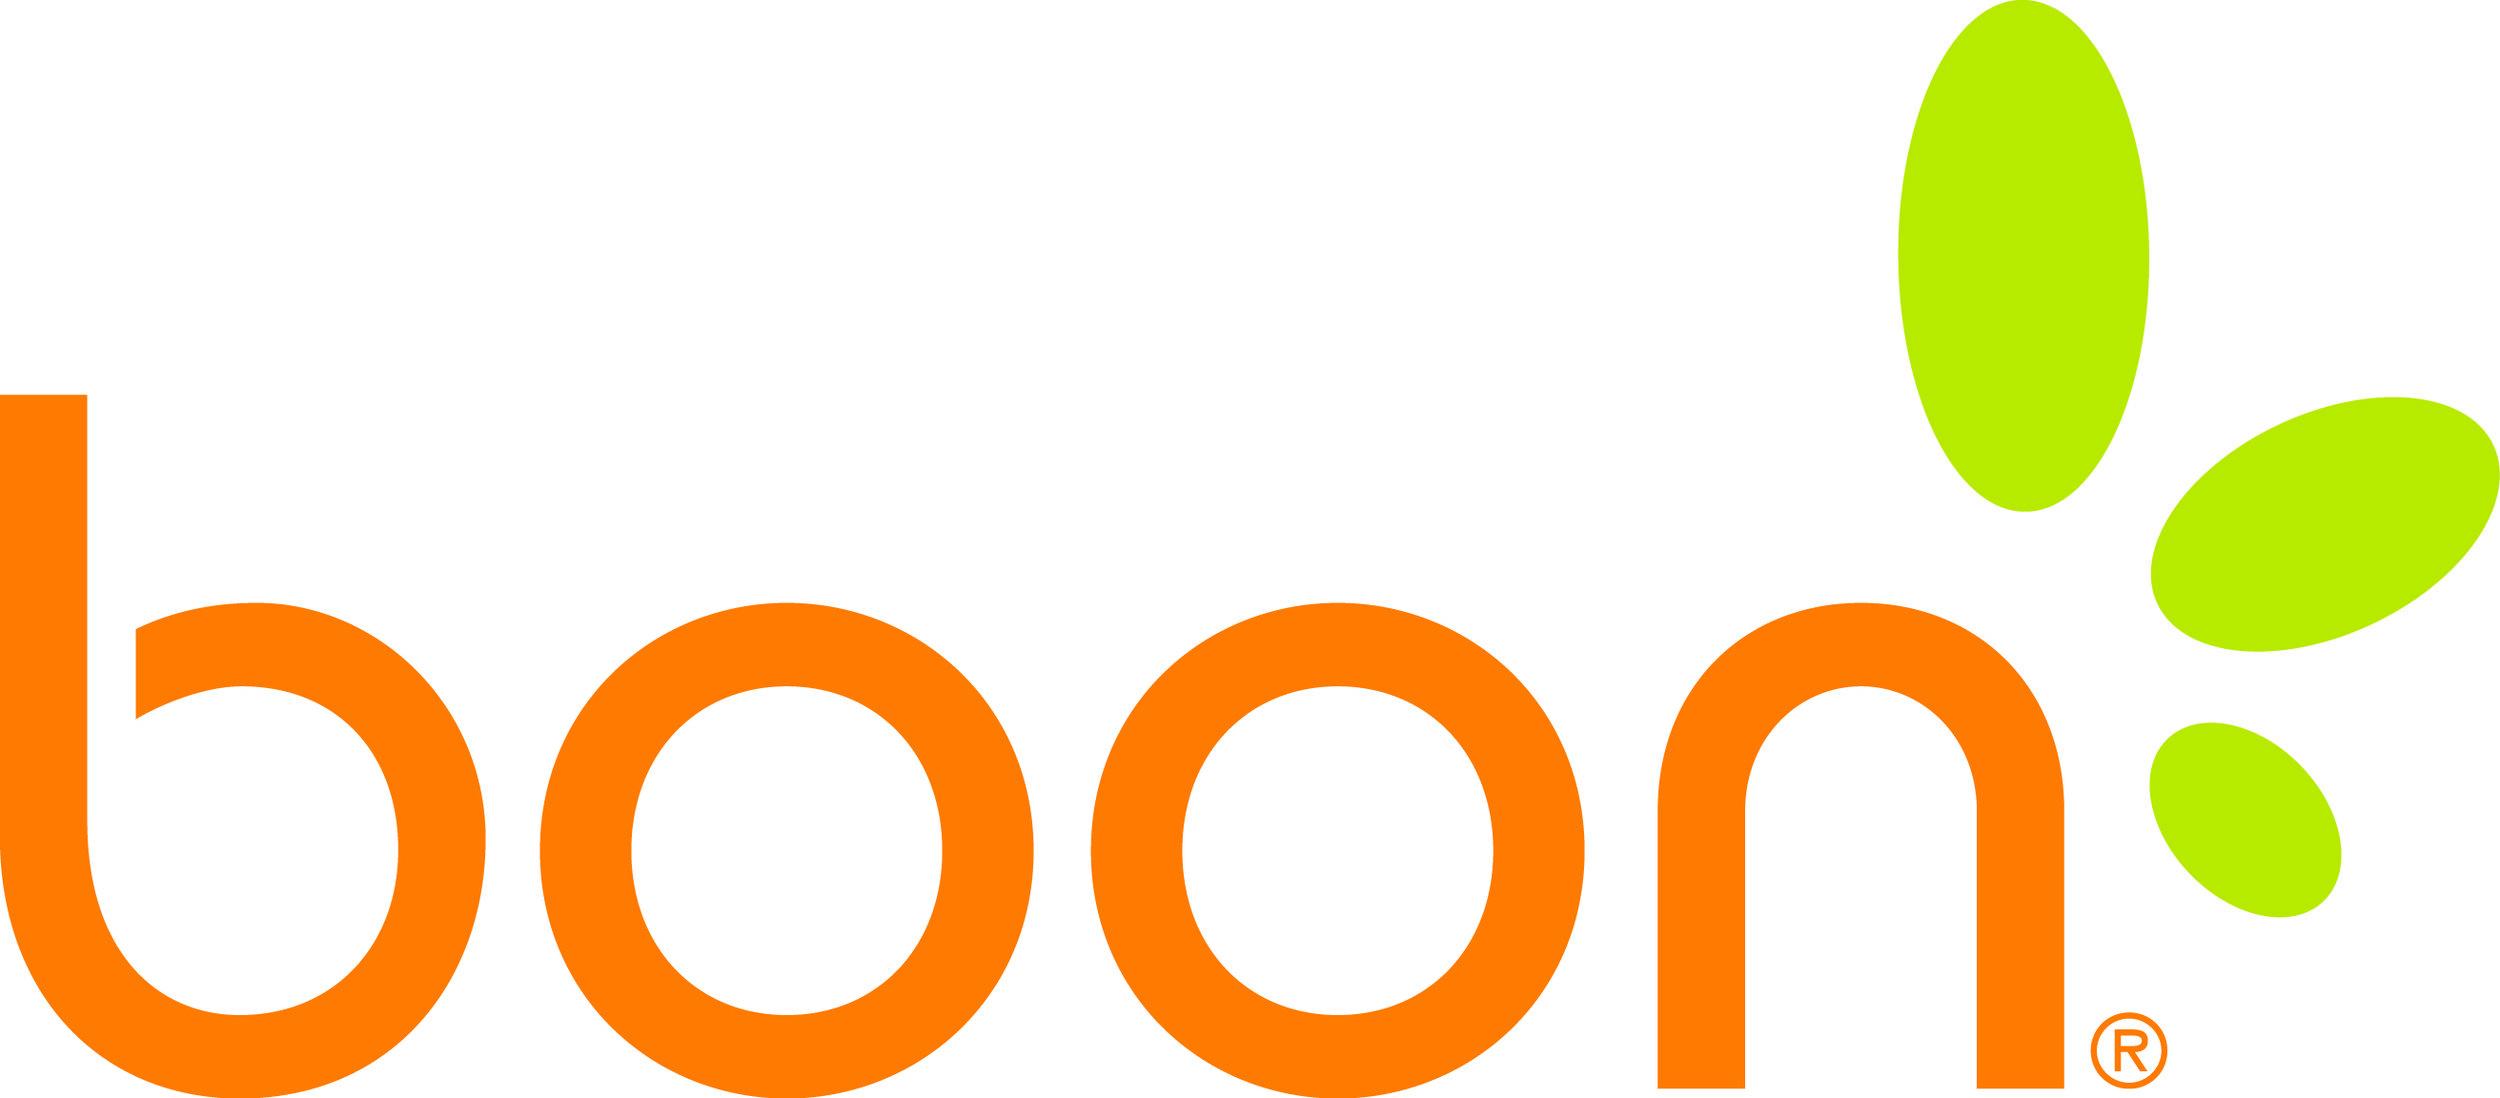 BOON_LOGO.jpg